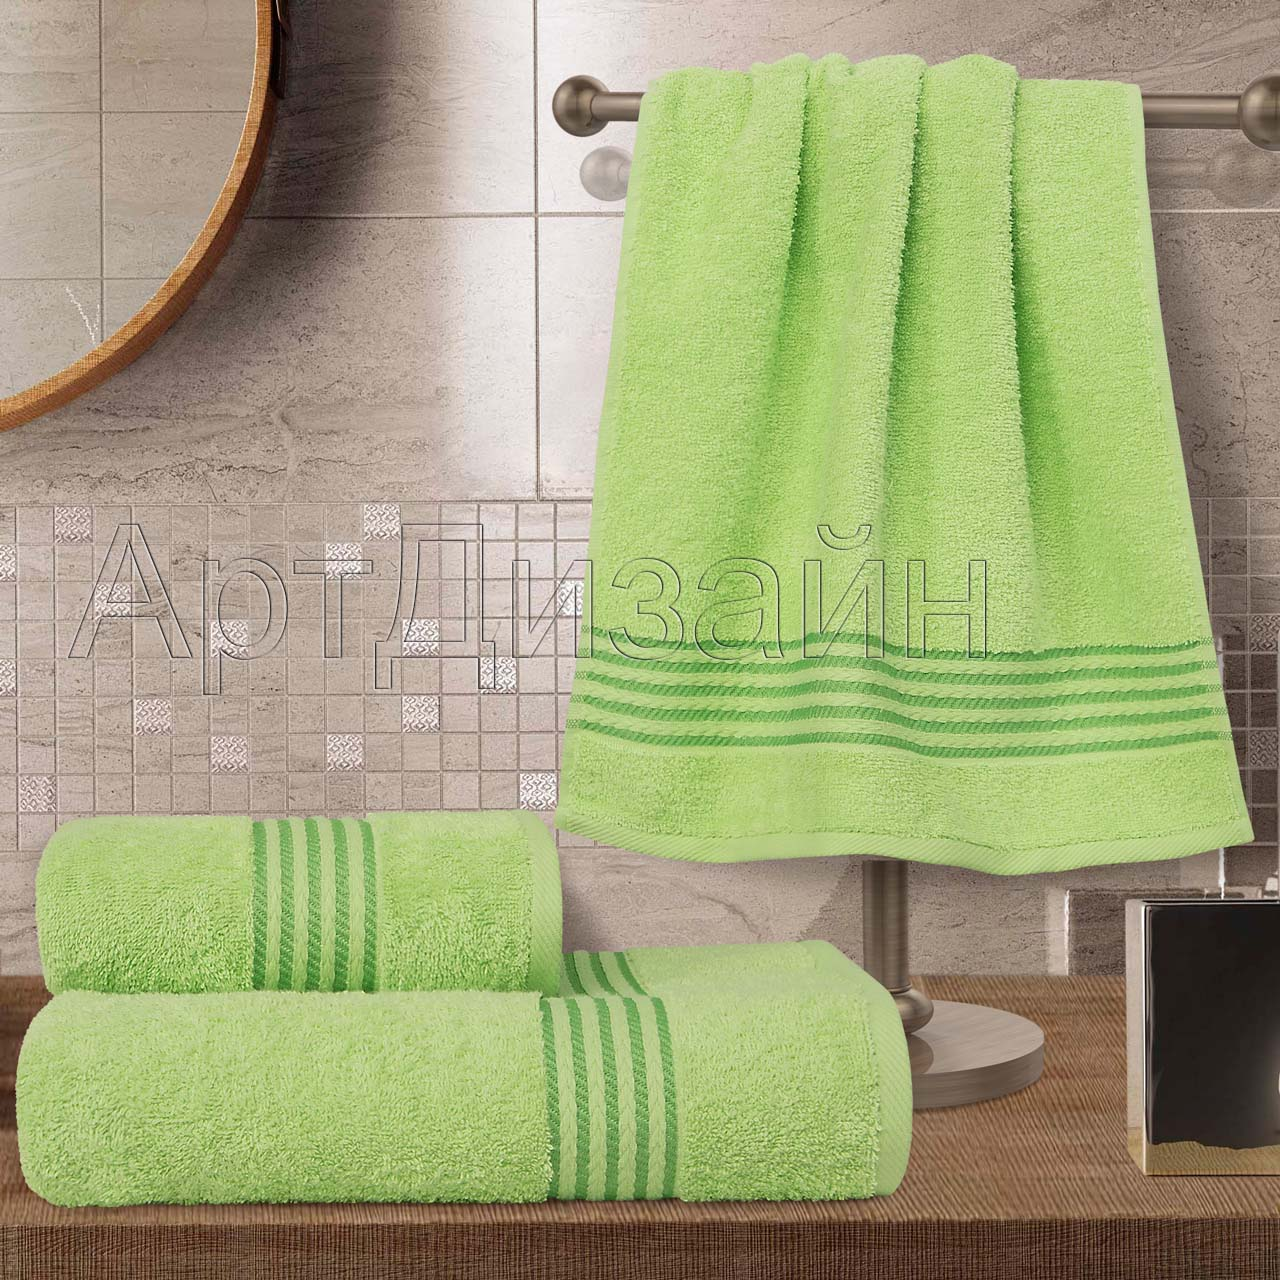 Полотенце Классик Светло-зеленый р. 50х90Махровые полотенца<br>Плотность:400 г/кв. м<br><br>Тип: Полотенце<br>Размер: 50х90<br>Материал: Махра